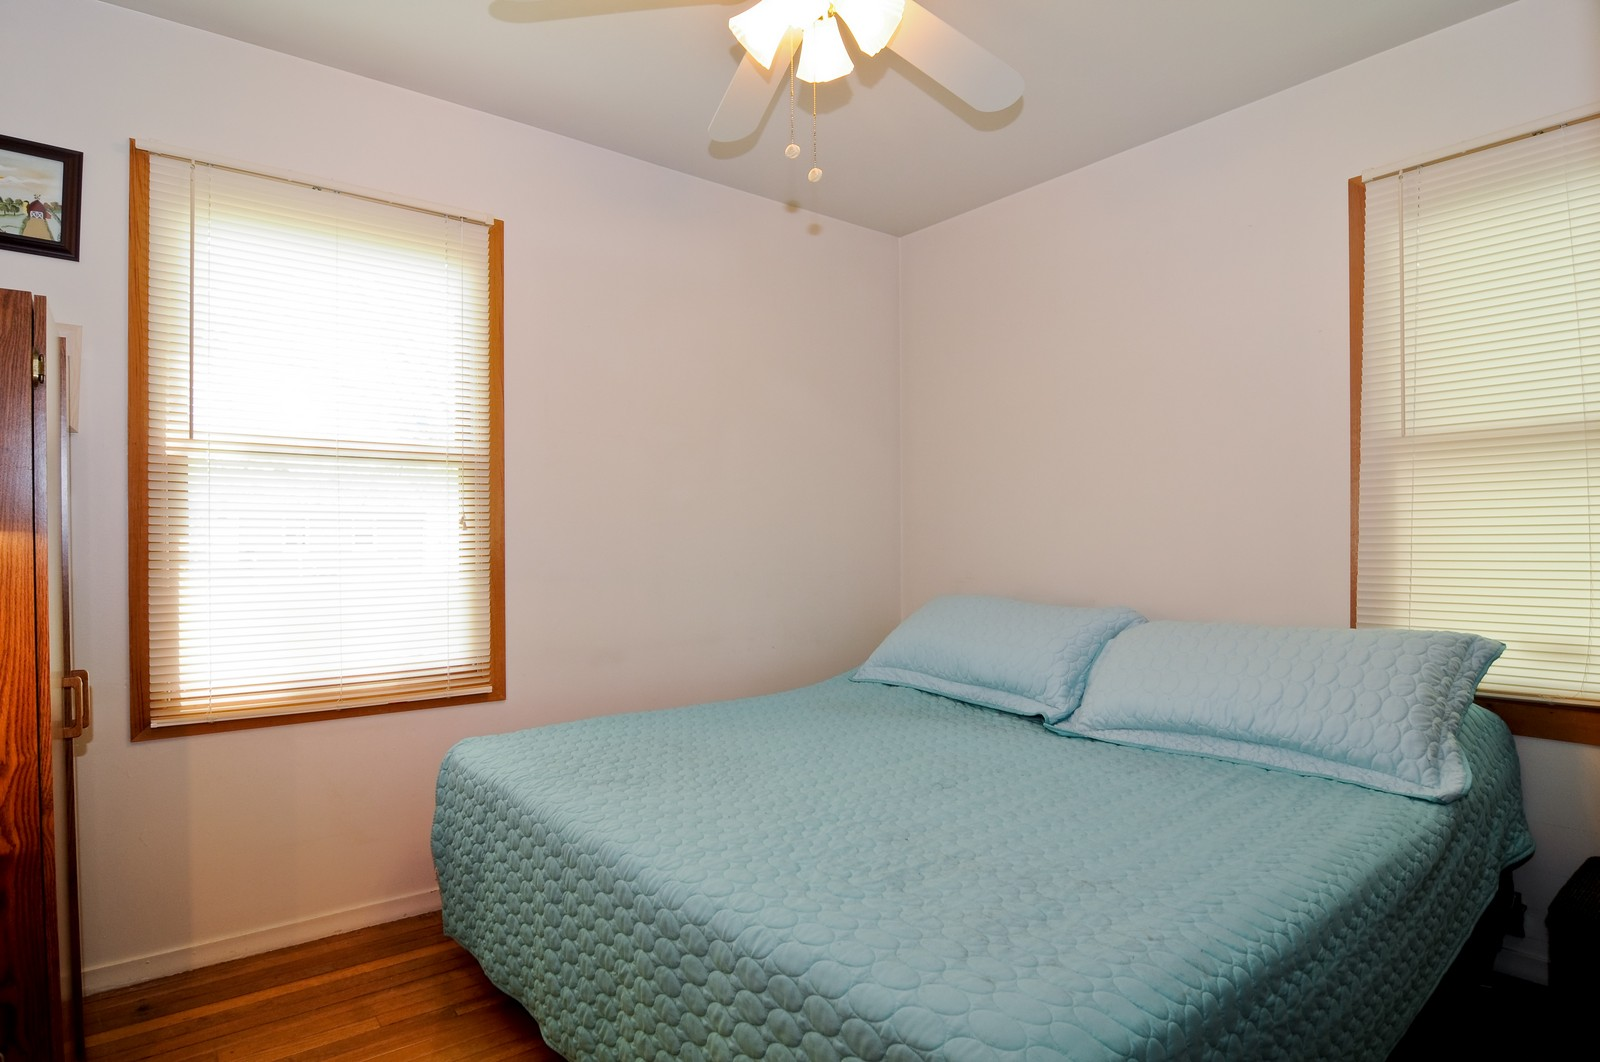 Real Estate Photography - 2125 222nd, Sauk Village, IL, 60411 - 2nd Bedroom